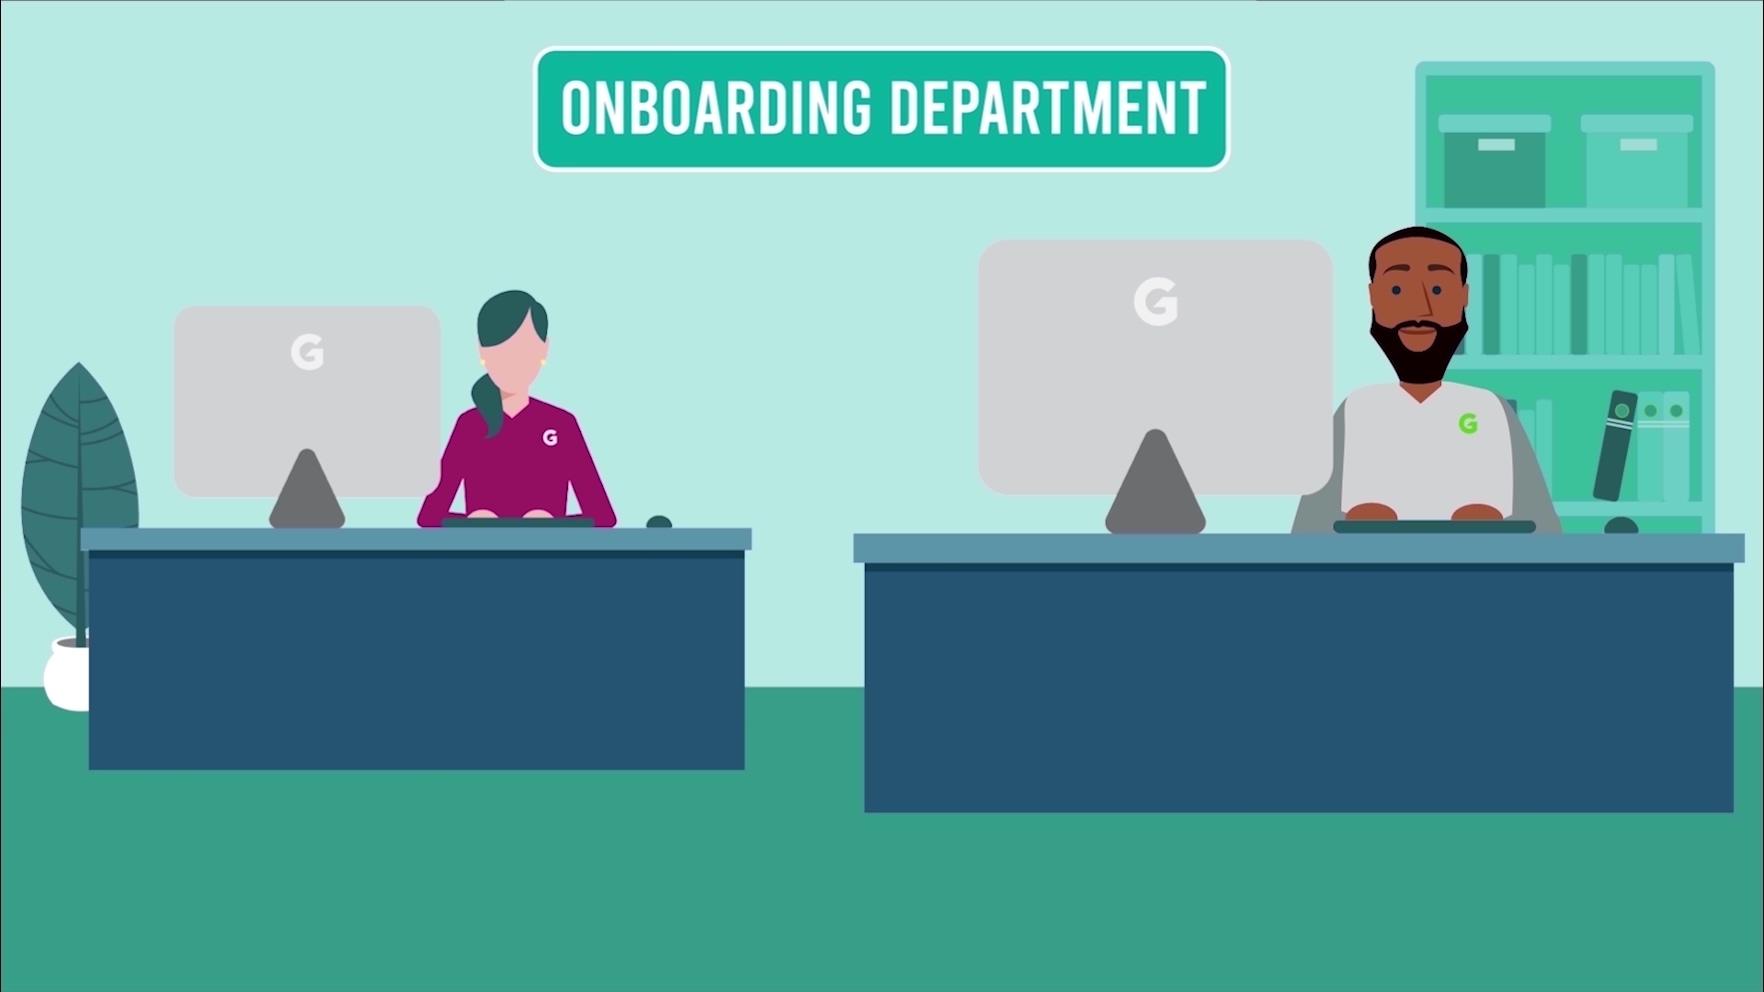 2021 GL New Customer Onboarding Video